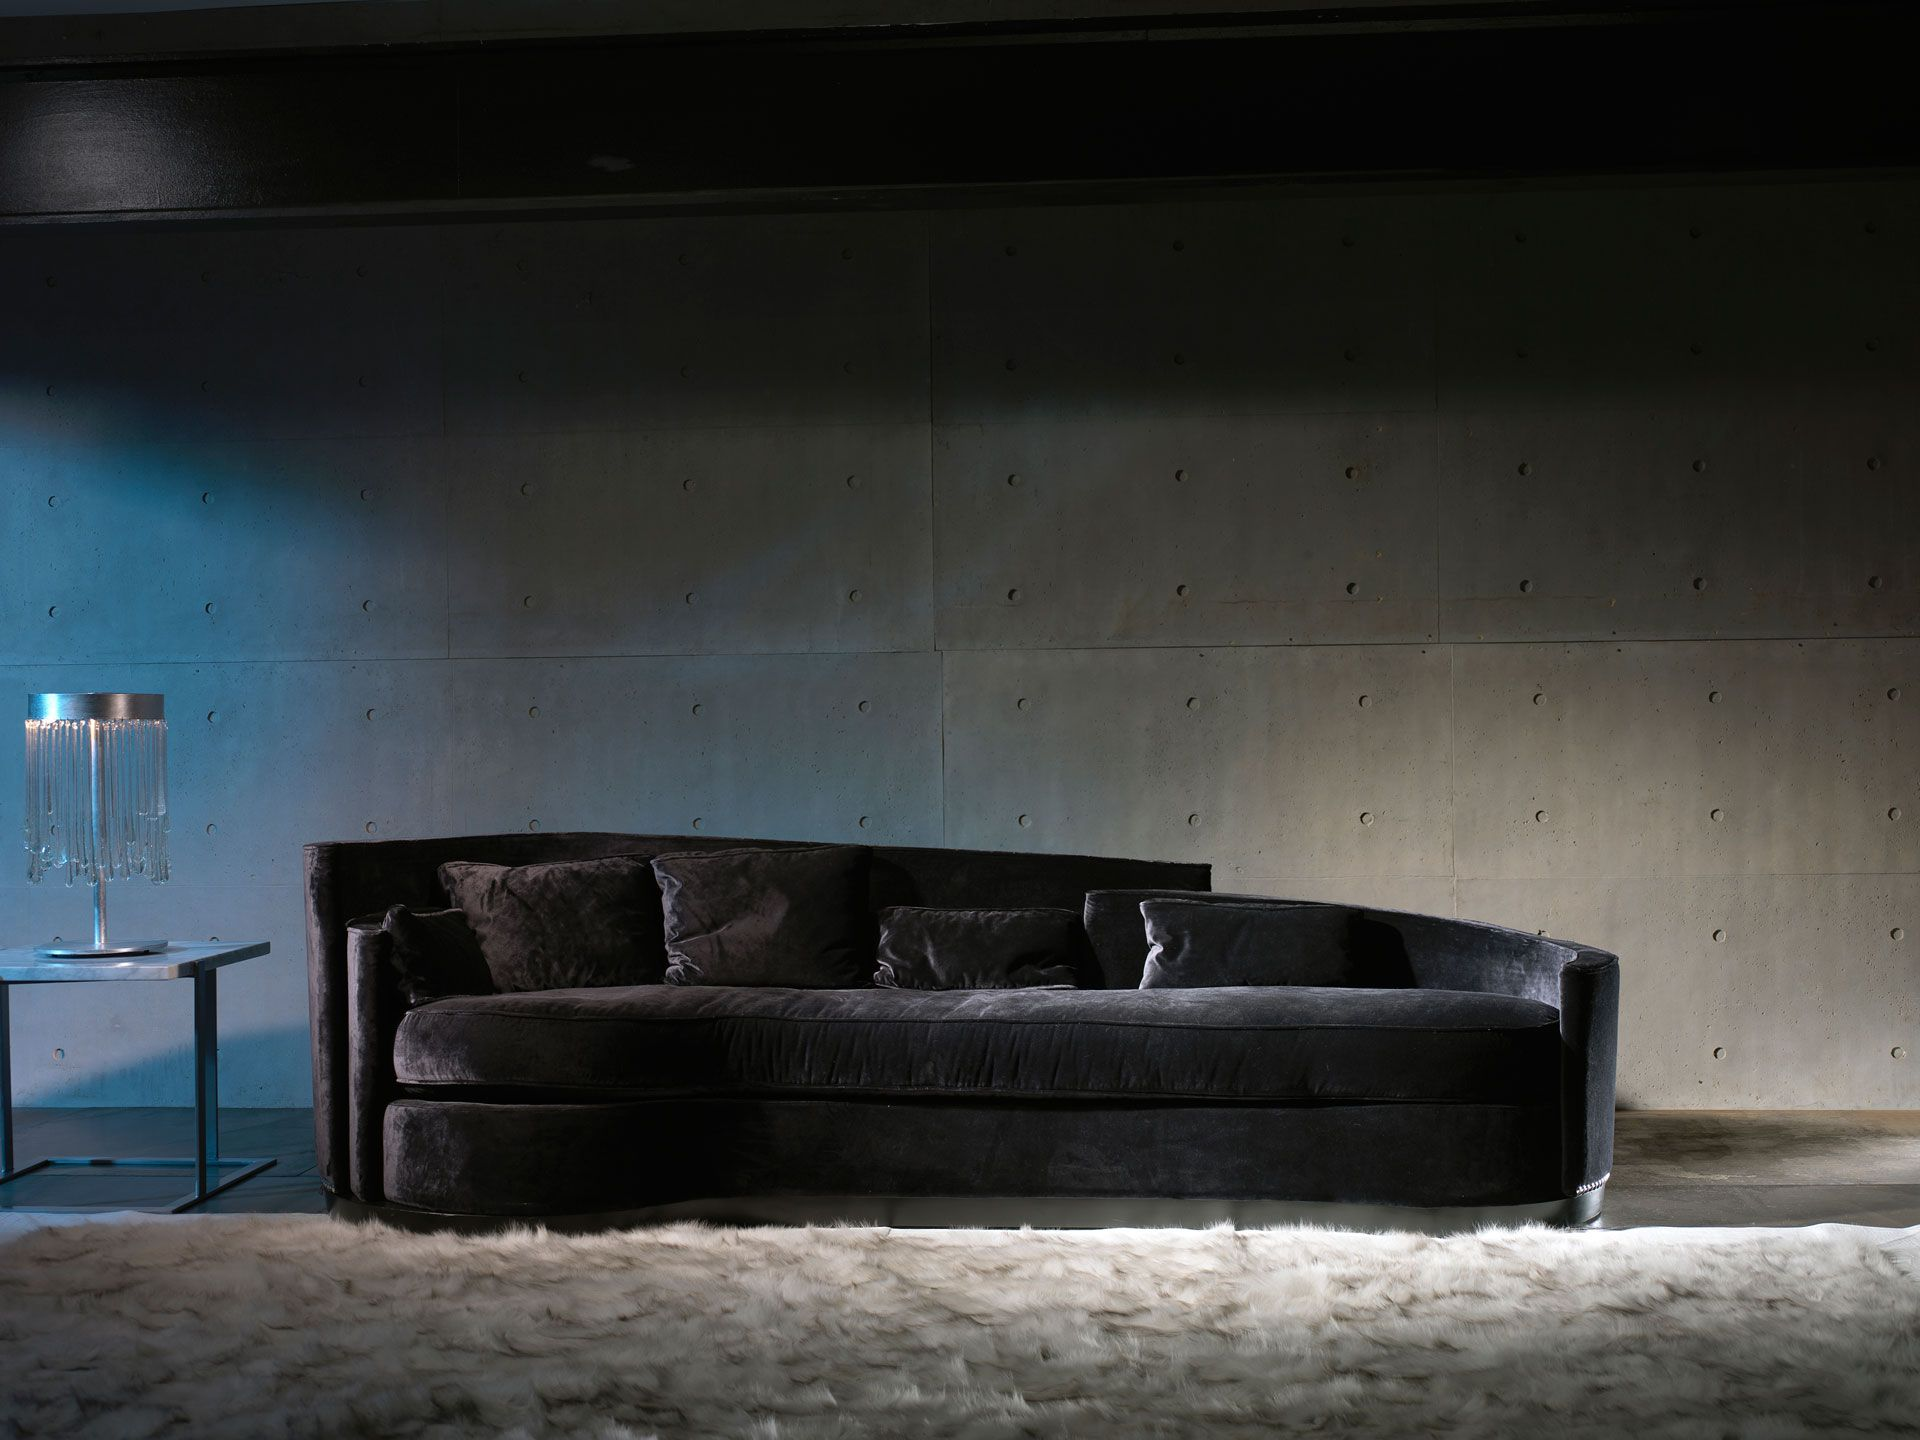 Flofa Sofa Latorre Ascensionlatorre Luxuryfurniture Luxe